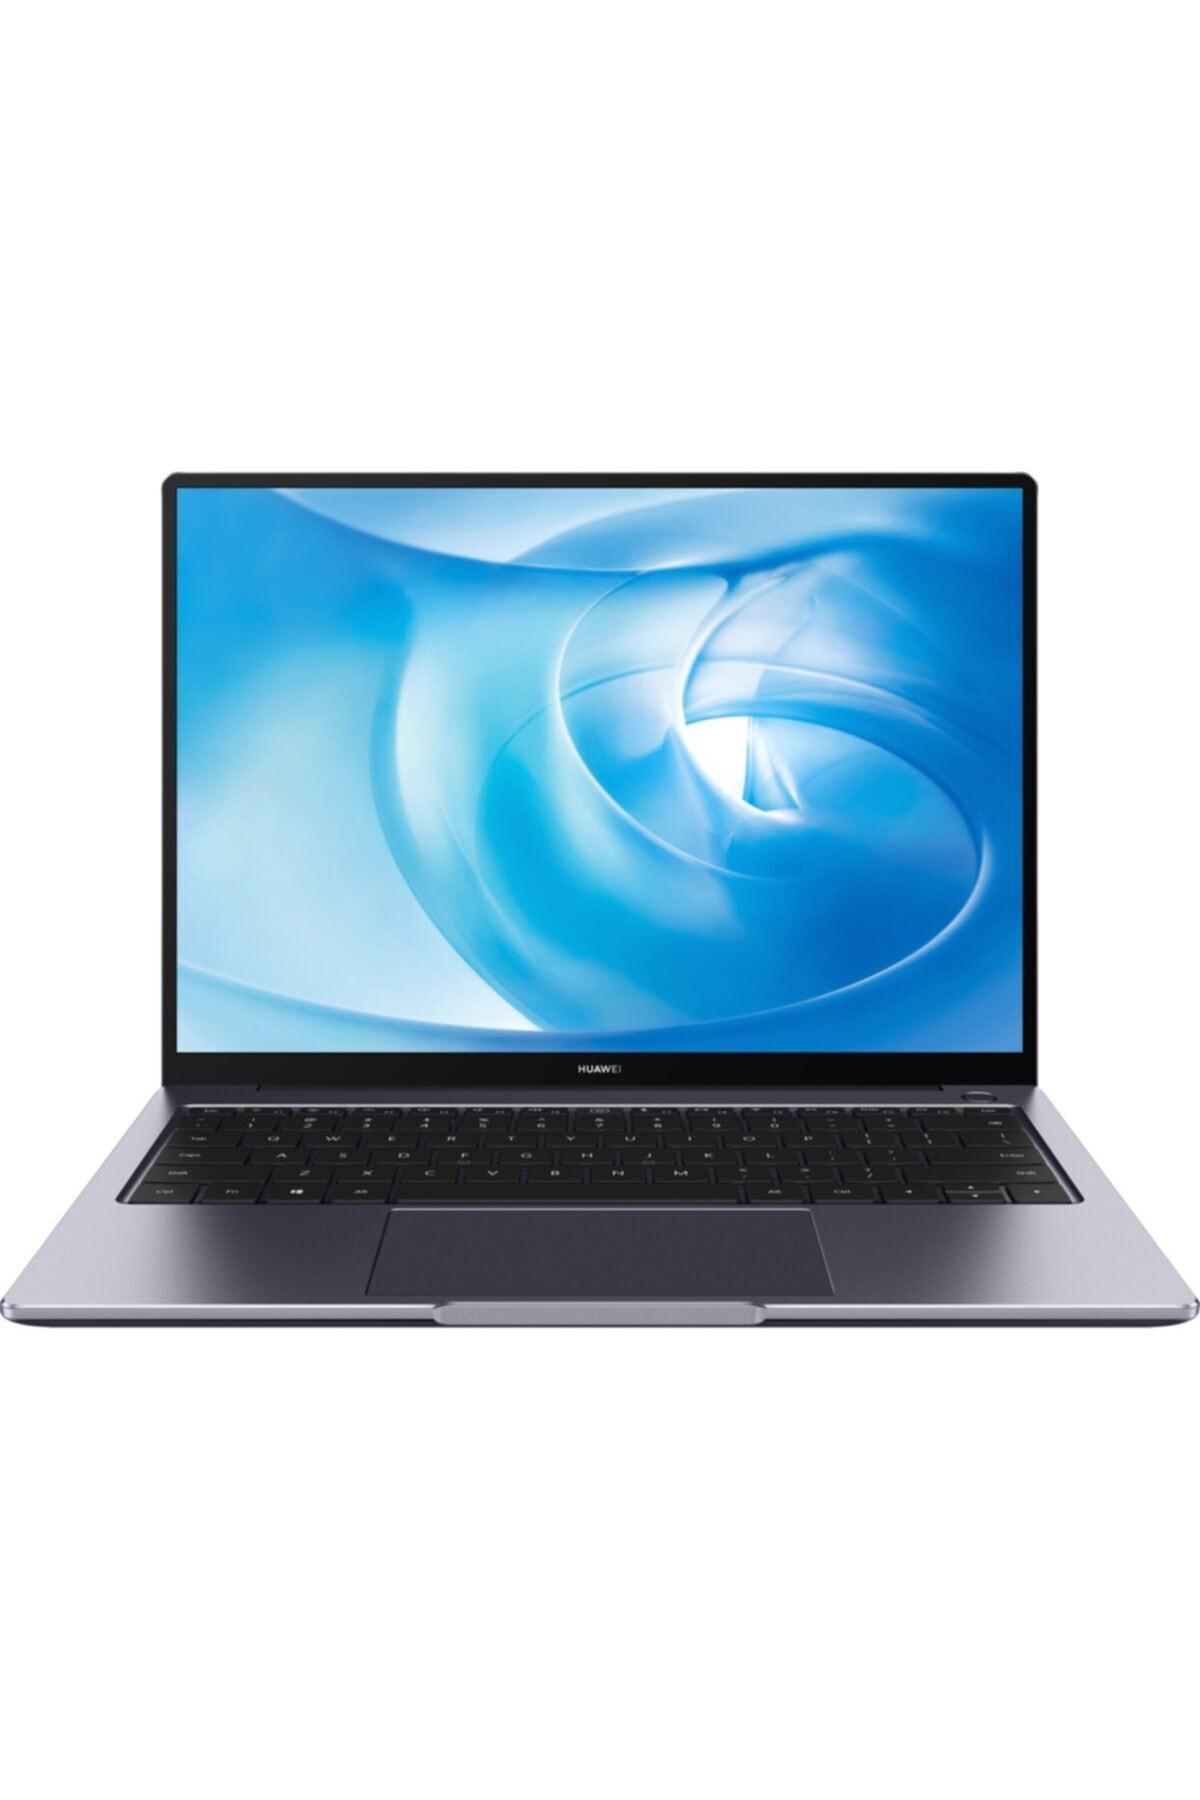 "Matebook 14 Amd Ryzen 5 4600h 16gb 512gb Ssd Windows 10 Home 14"" Qhd Taşınabilir Bilgisayar"